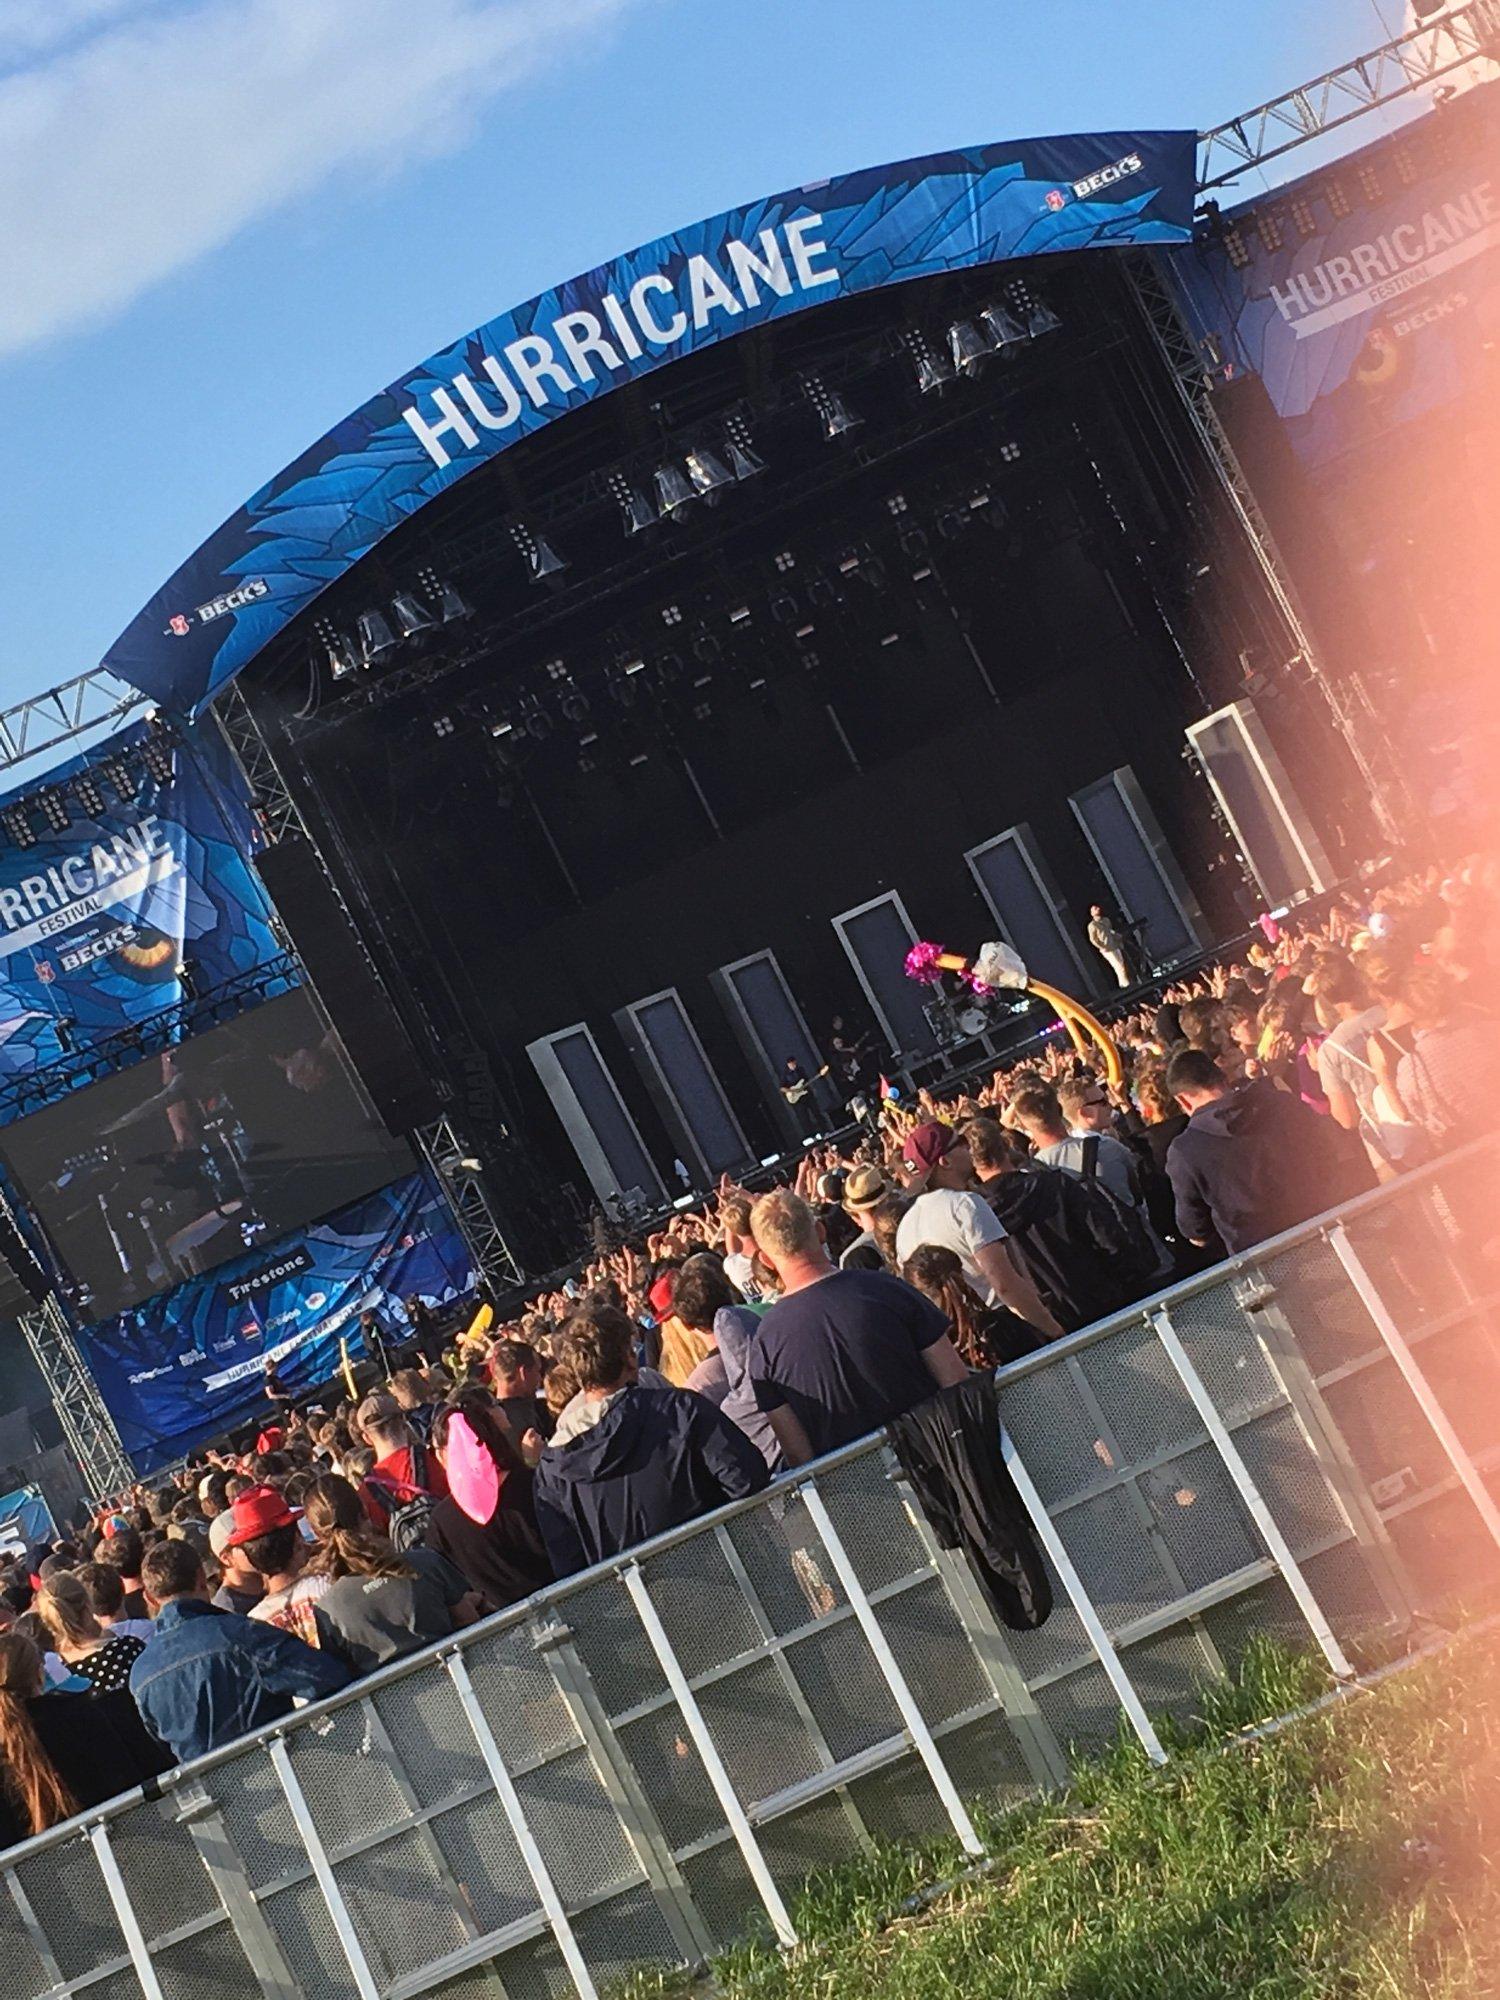 Hurricane Festival 2016: Two Door Cinema Club